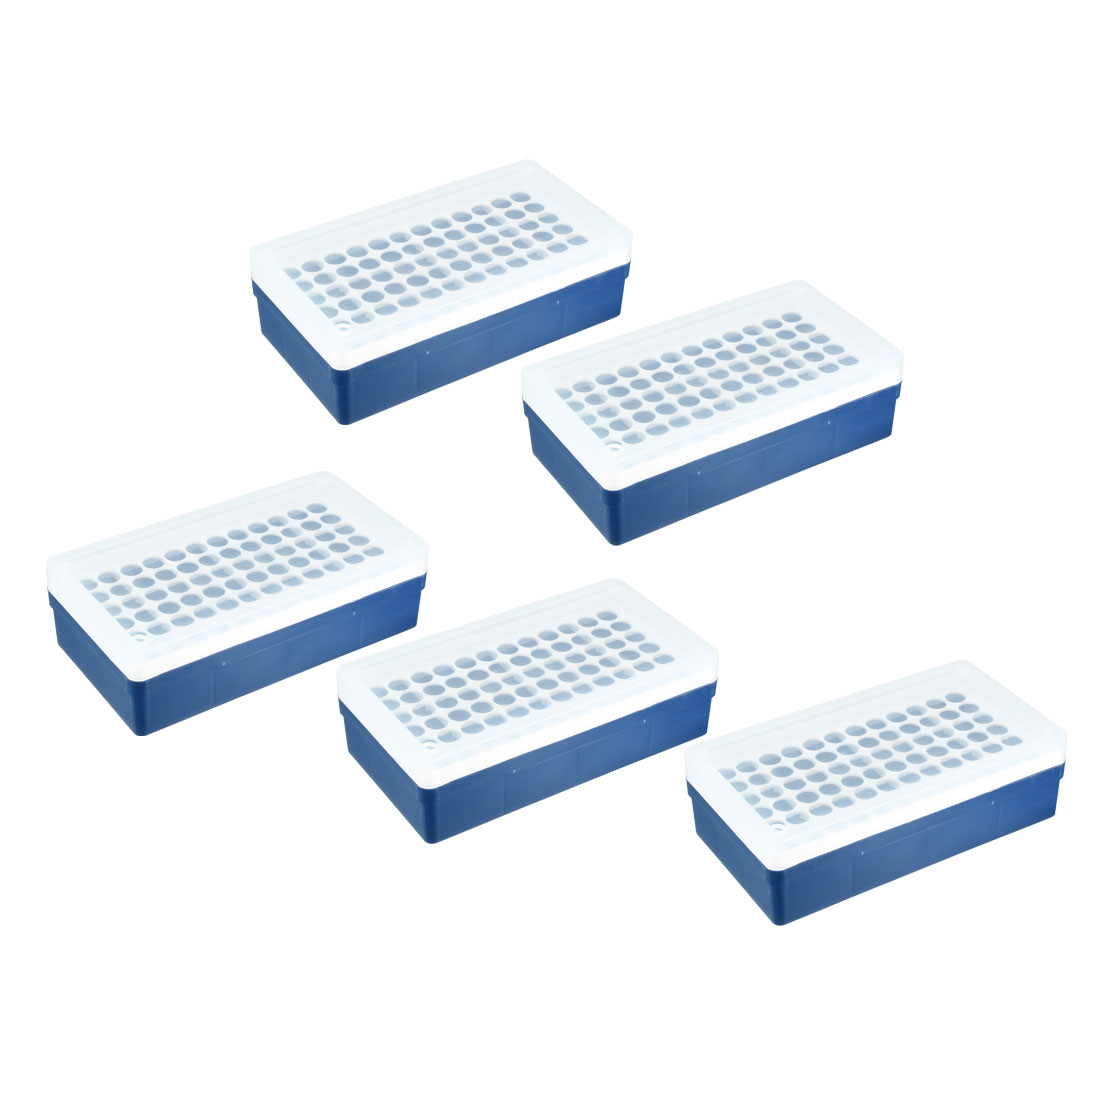 72-Well Centrifuge PCR Tube Holder Rack Storage Box Case Blue Clear 5pcs